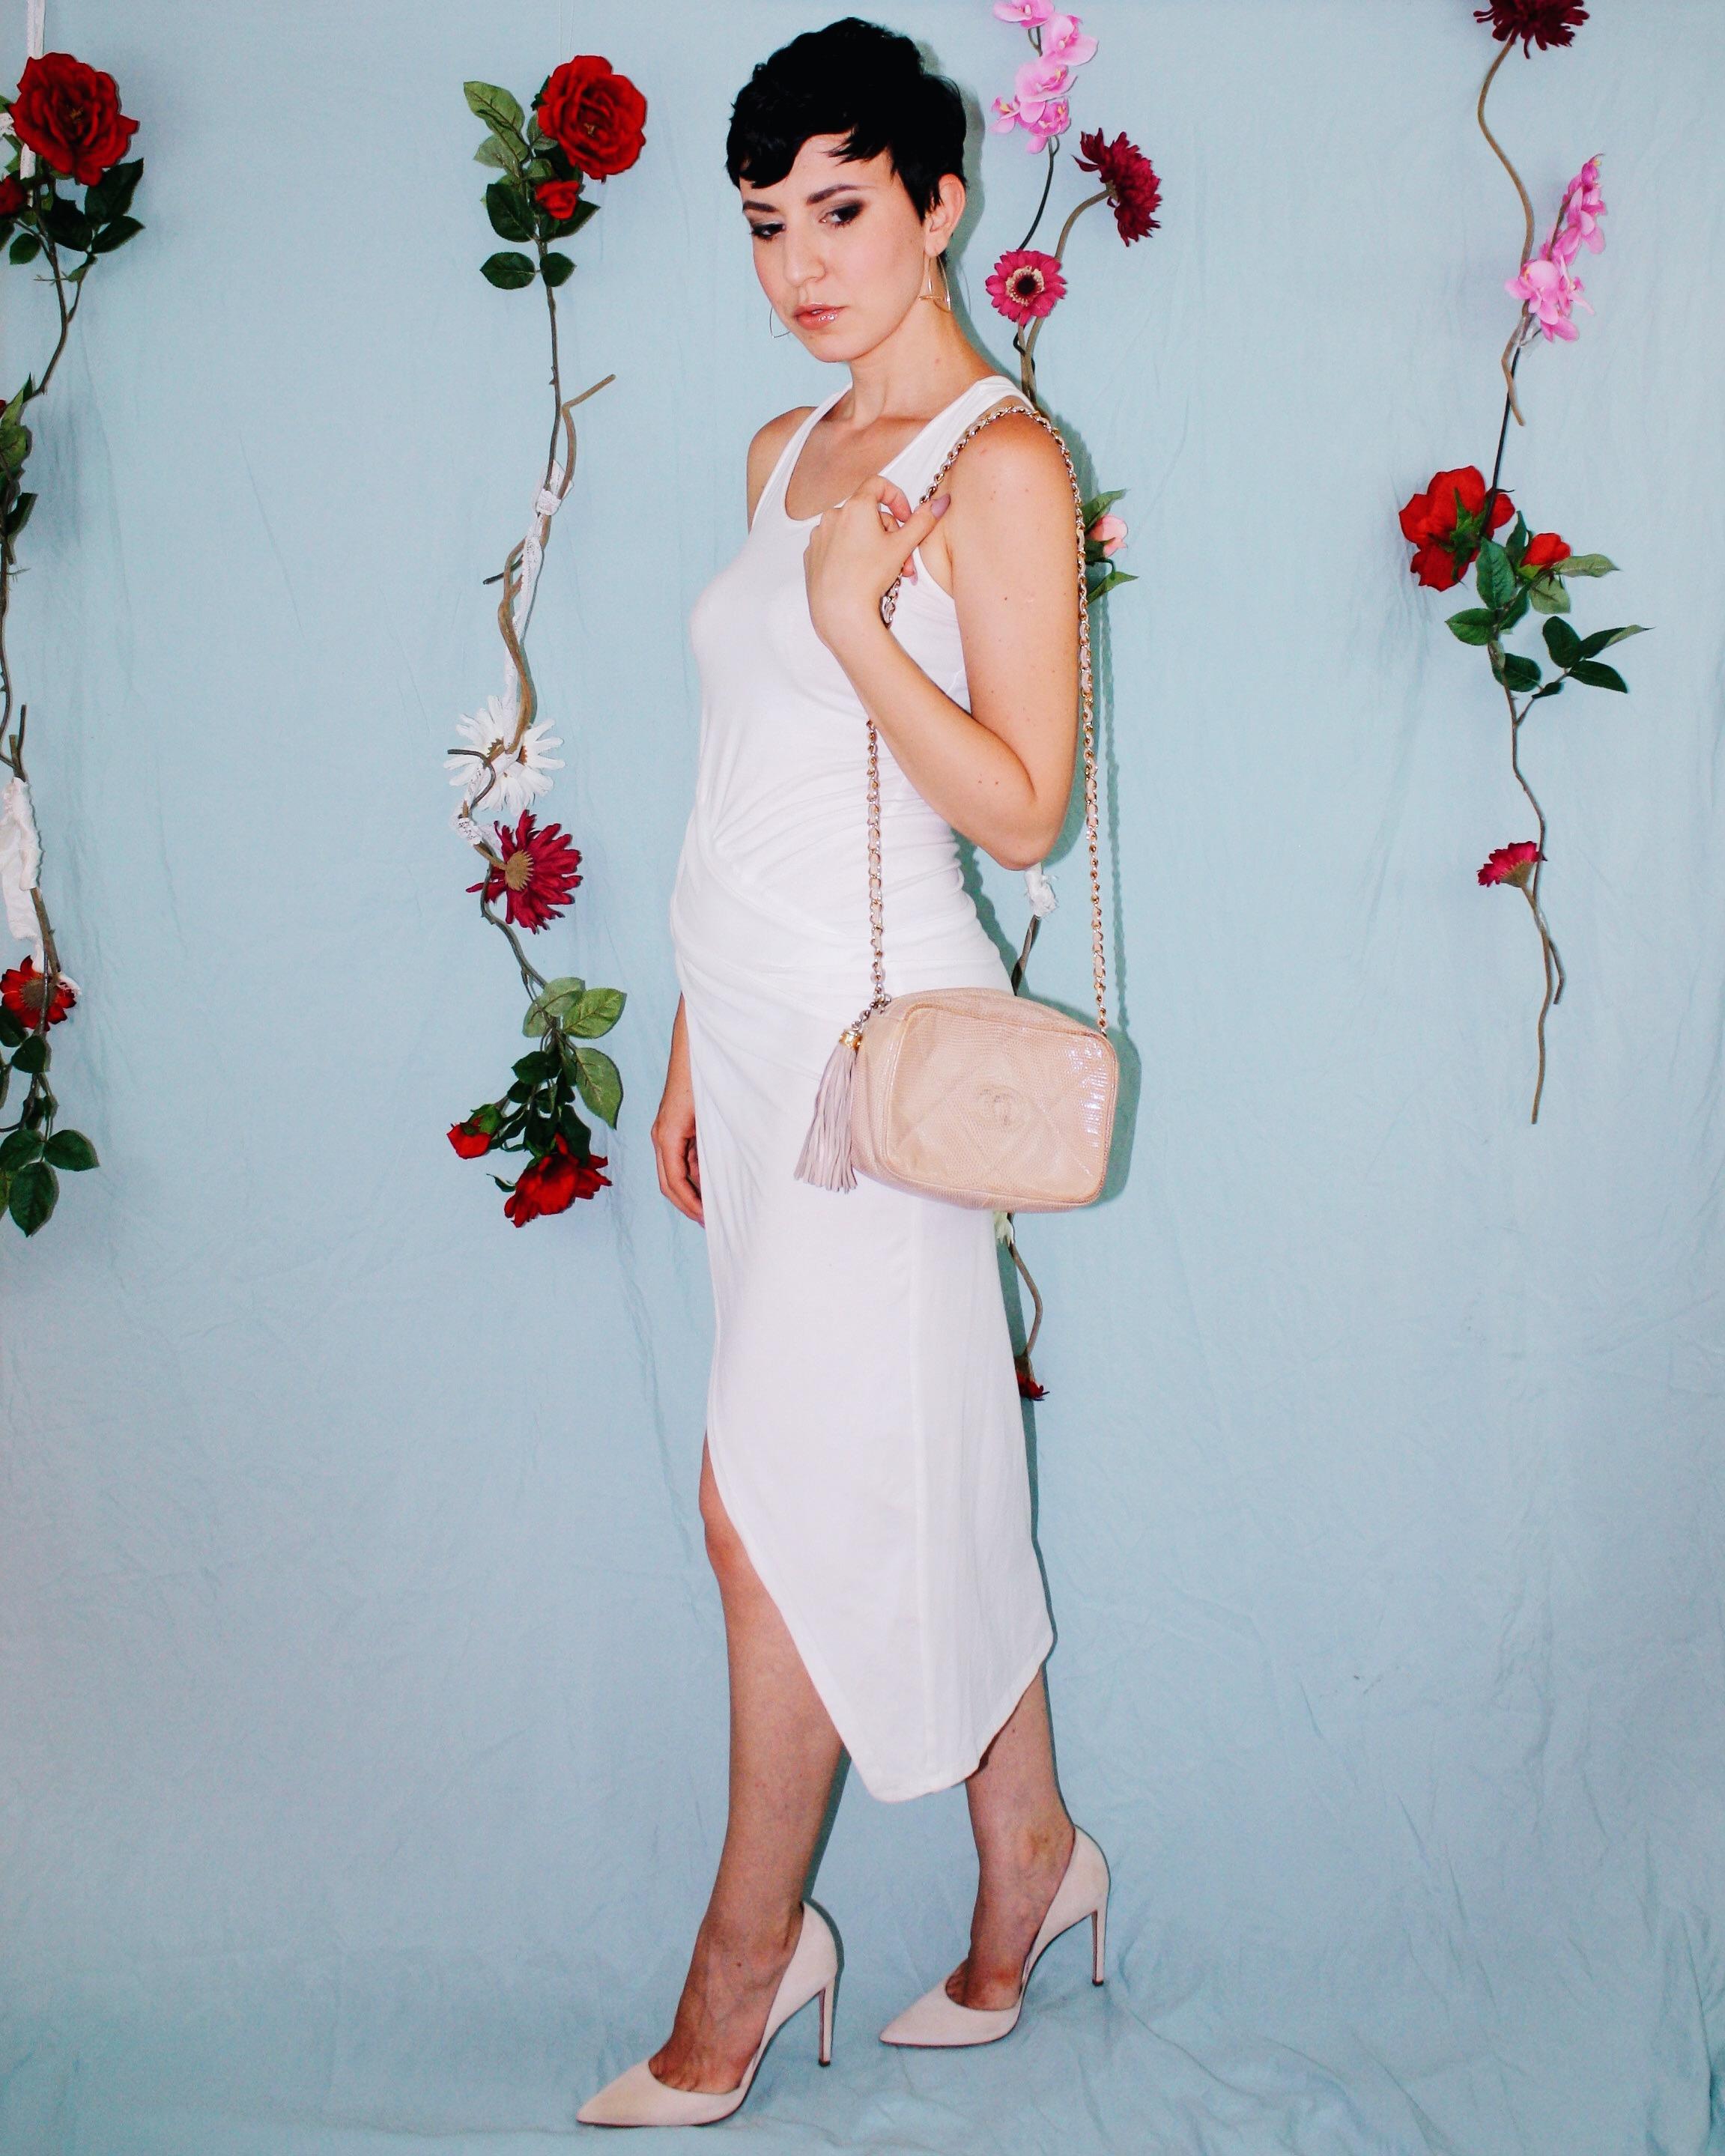 labor day outfit ideas white leggings silk tank lace boustier linen shorts dress chanel bag